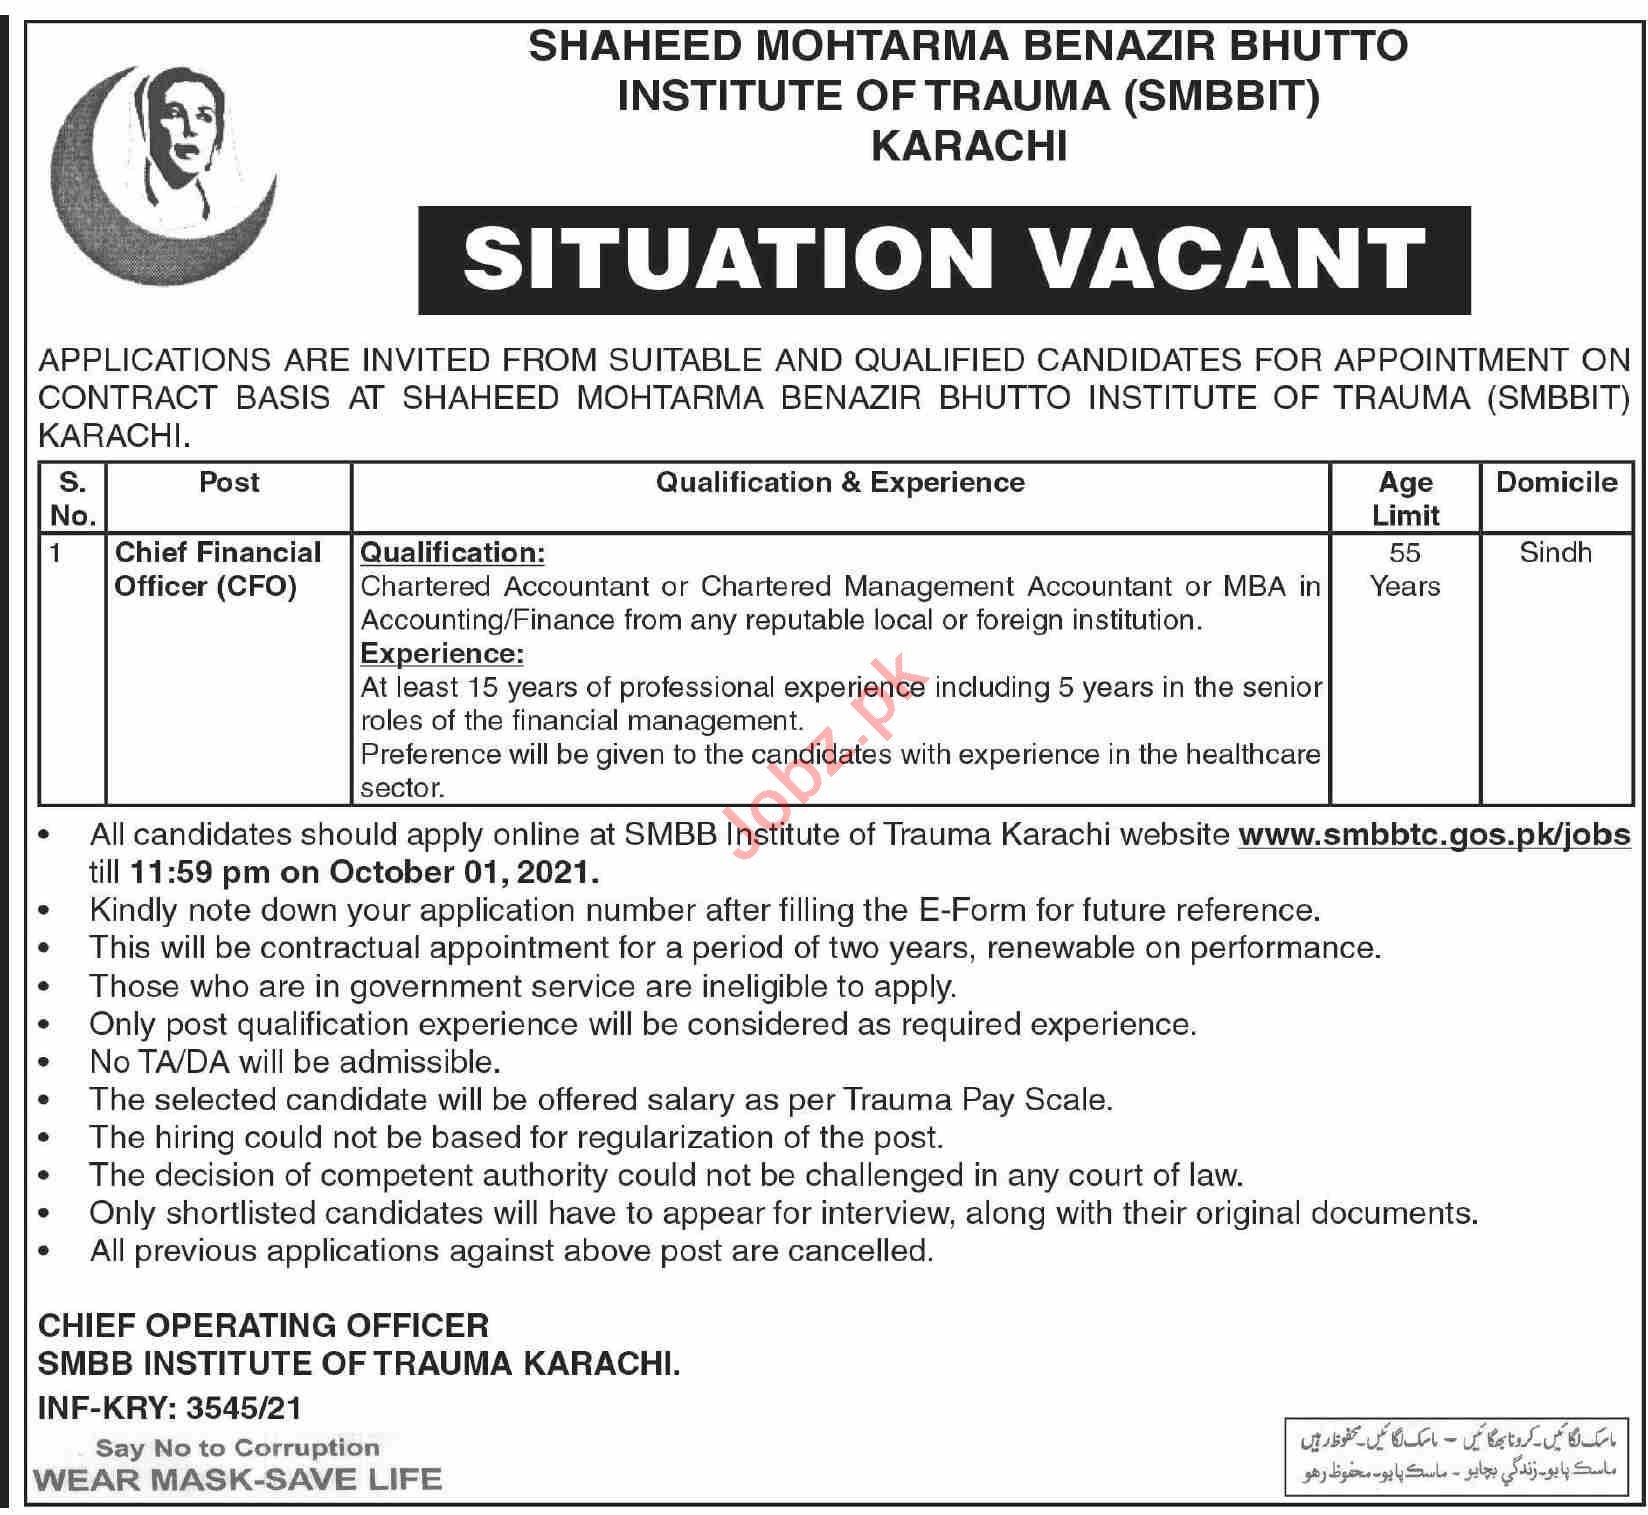 SMBB Institute of Trauma Karachi Jobs Interview 2021 for CFO